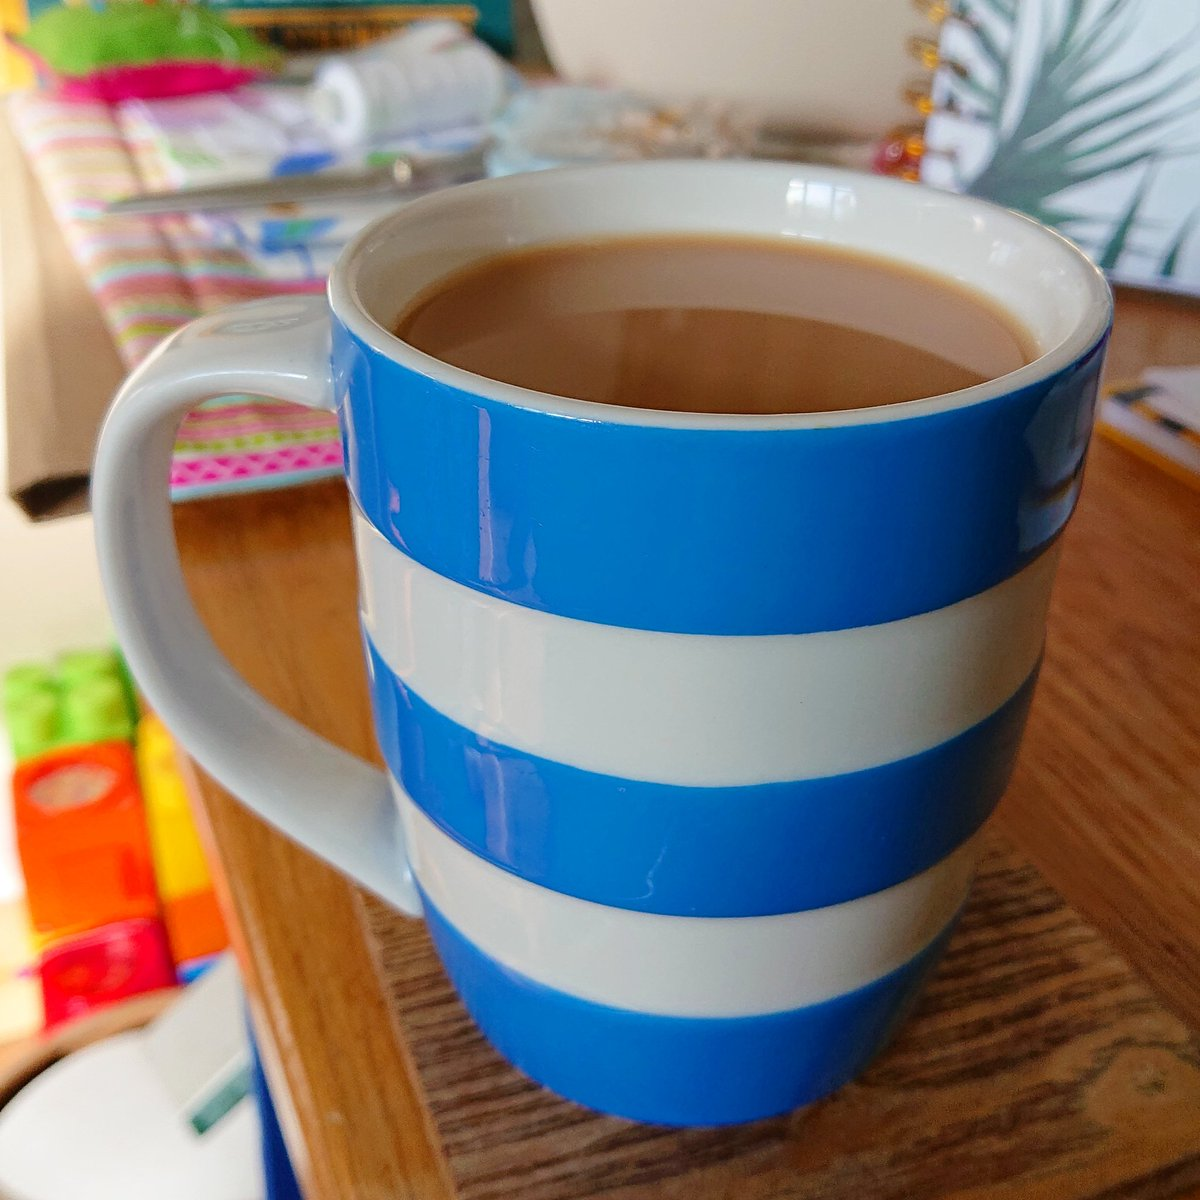 Cuppa time.. . . #Cornishware #cornwall #homedesign  #angelstrawbridge #homedecor #kitchendesign #relax #cuppatime #cupoftea #mumlife #motherslife #bluestripespic.twitter.com/3zHgjzKz0E